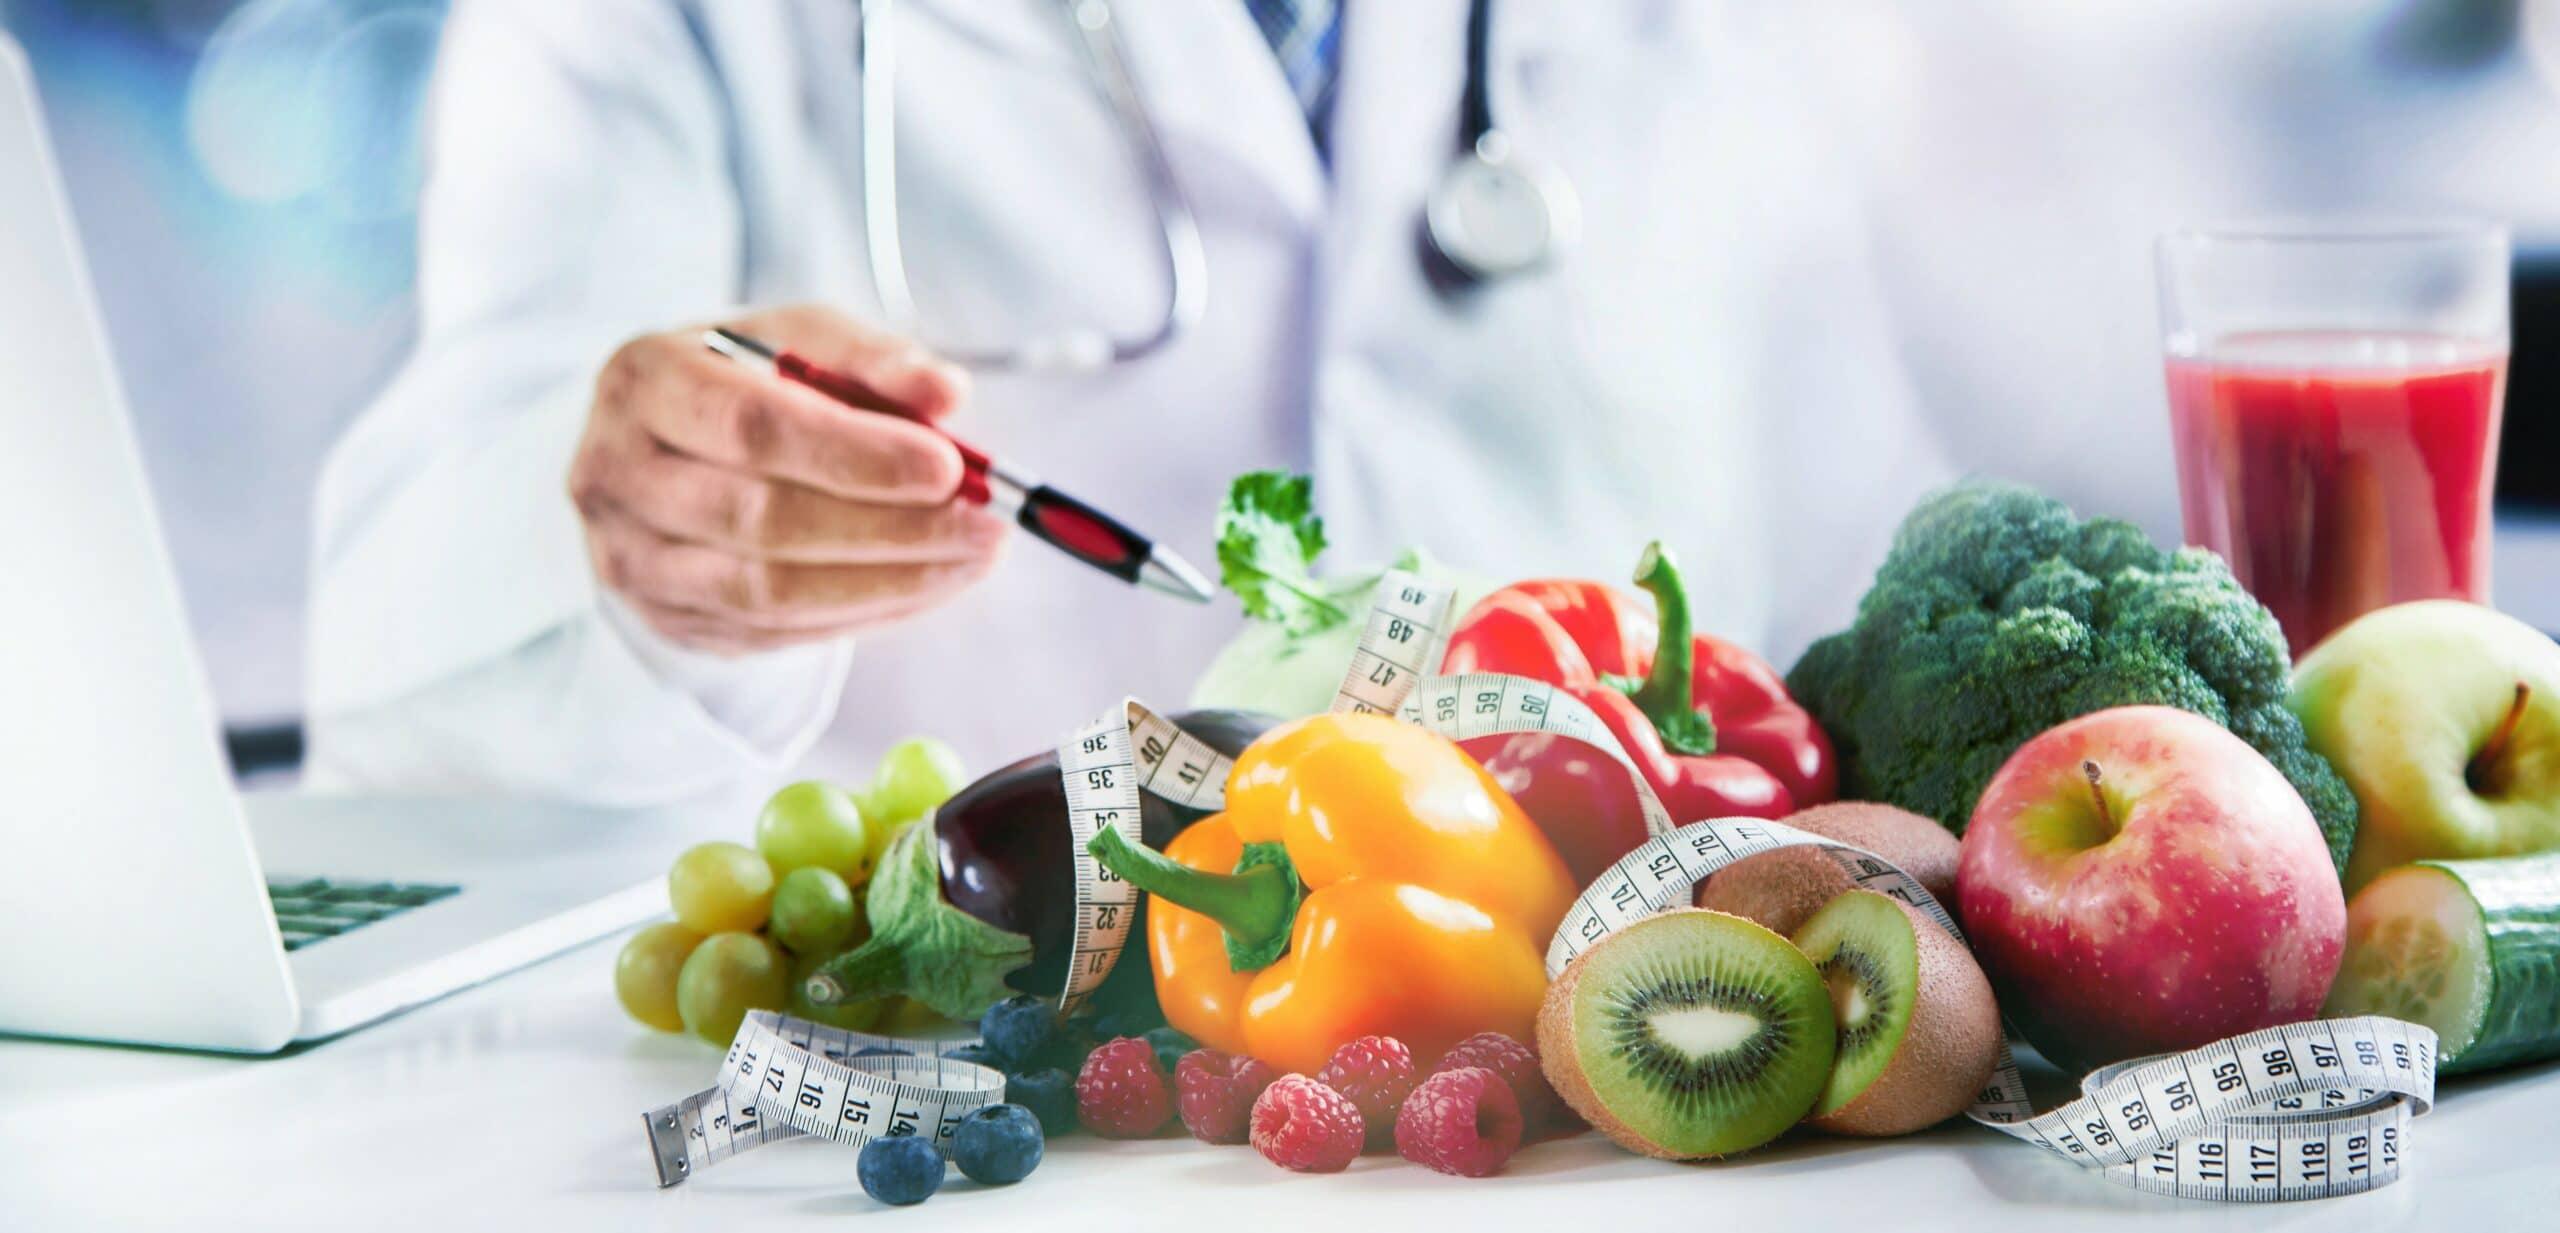 vitamina c nella dieta